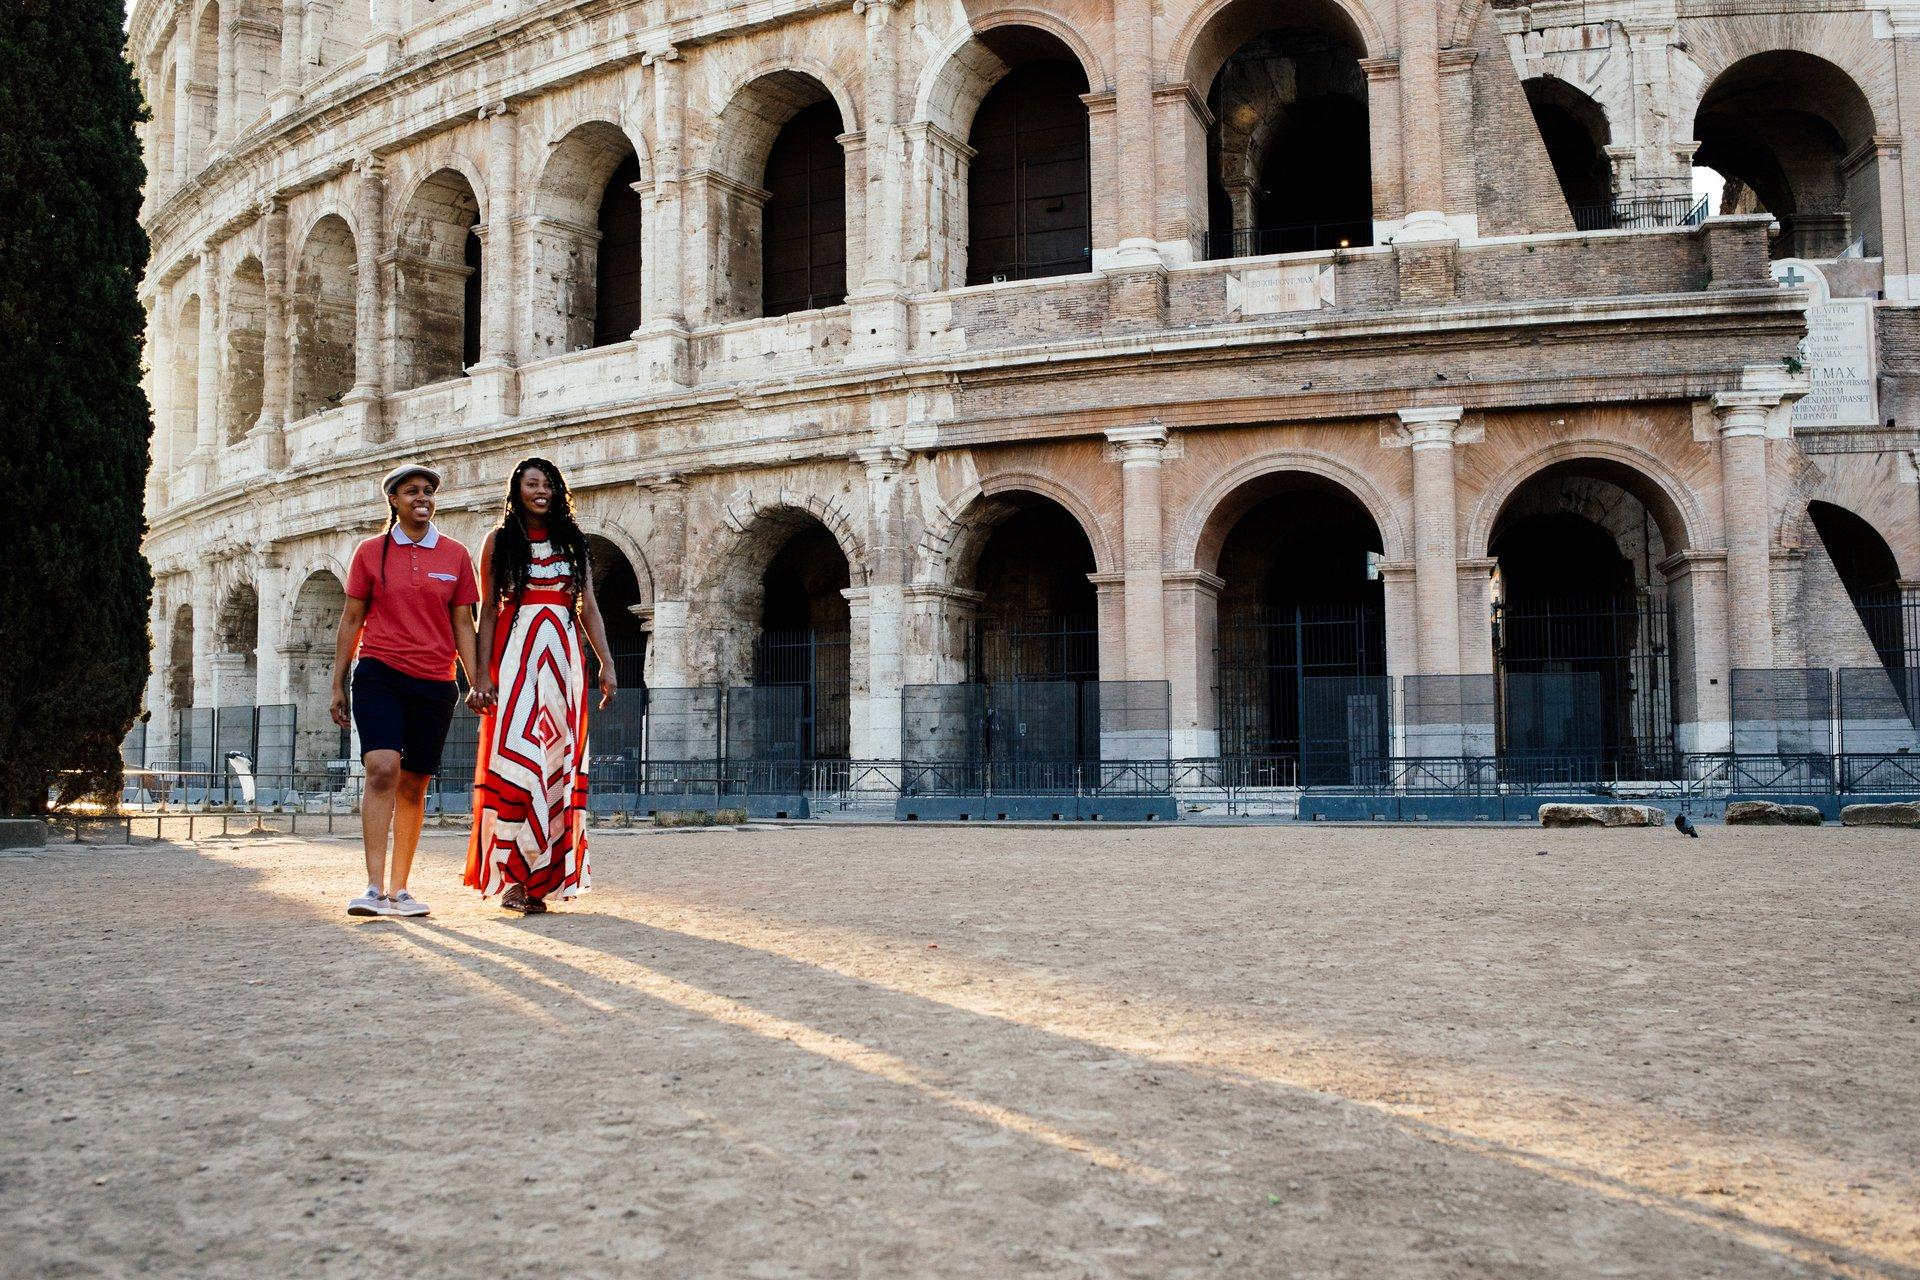 Rome-Italy-travel-story-Flytographer-49